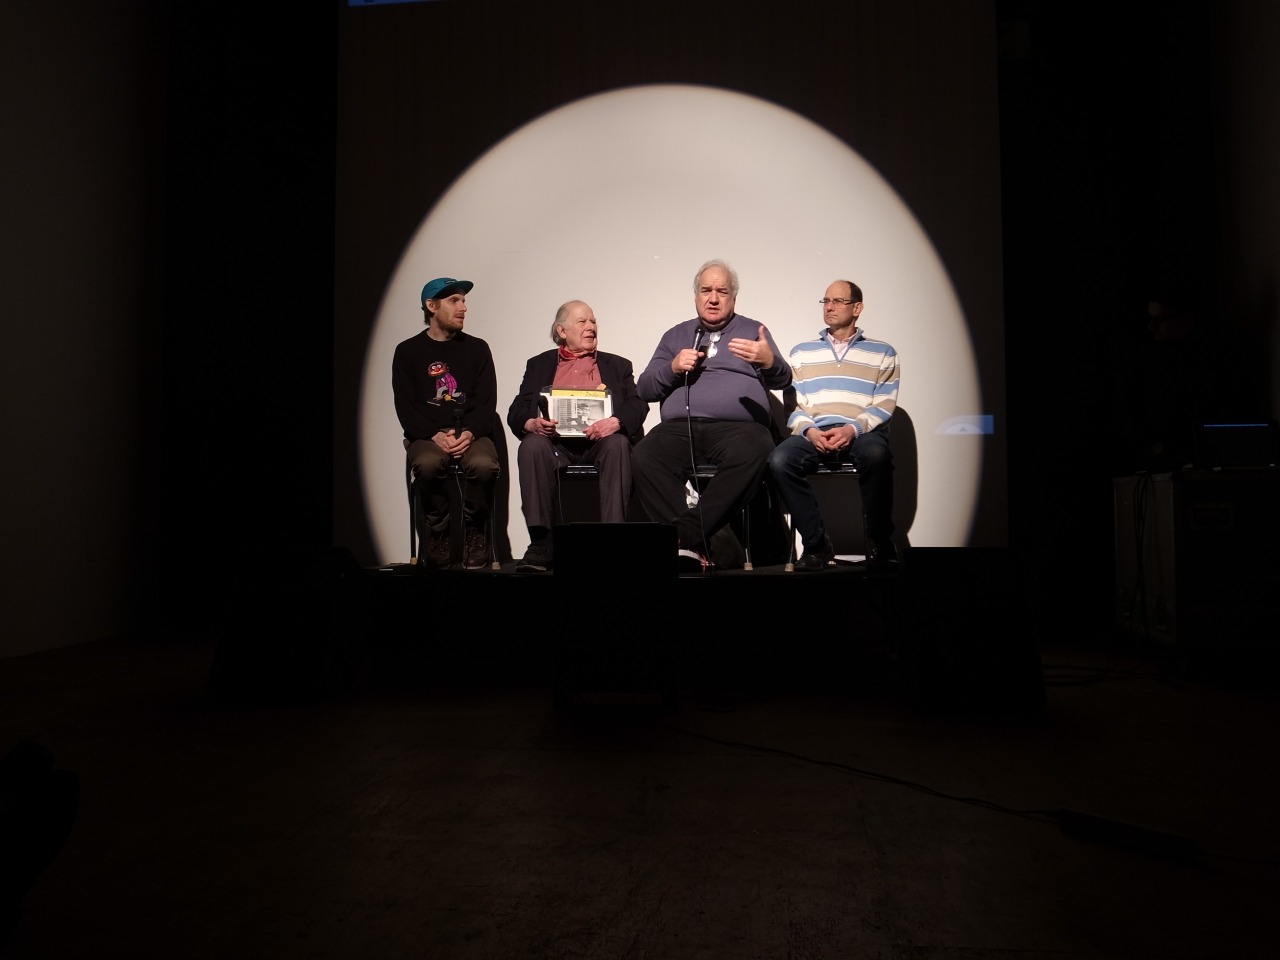 Cory Arcangel, Alan Abel, Bob Pagani, Albin Sadar. Feb. 232013